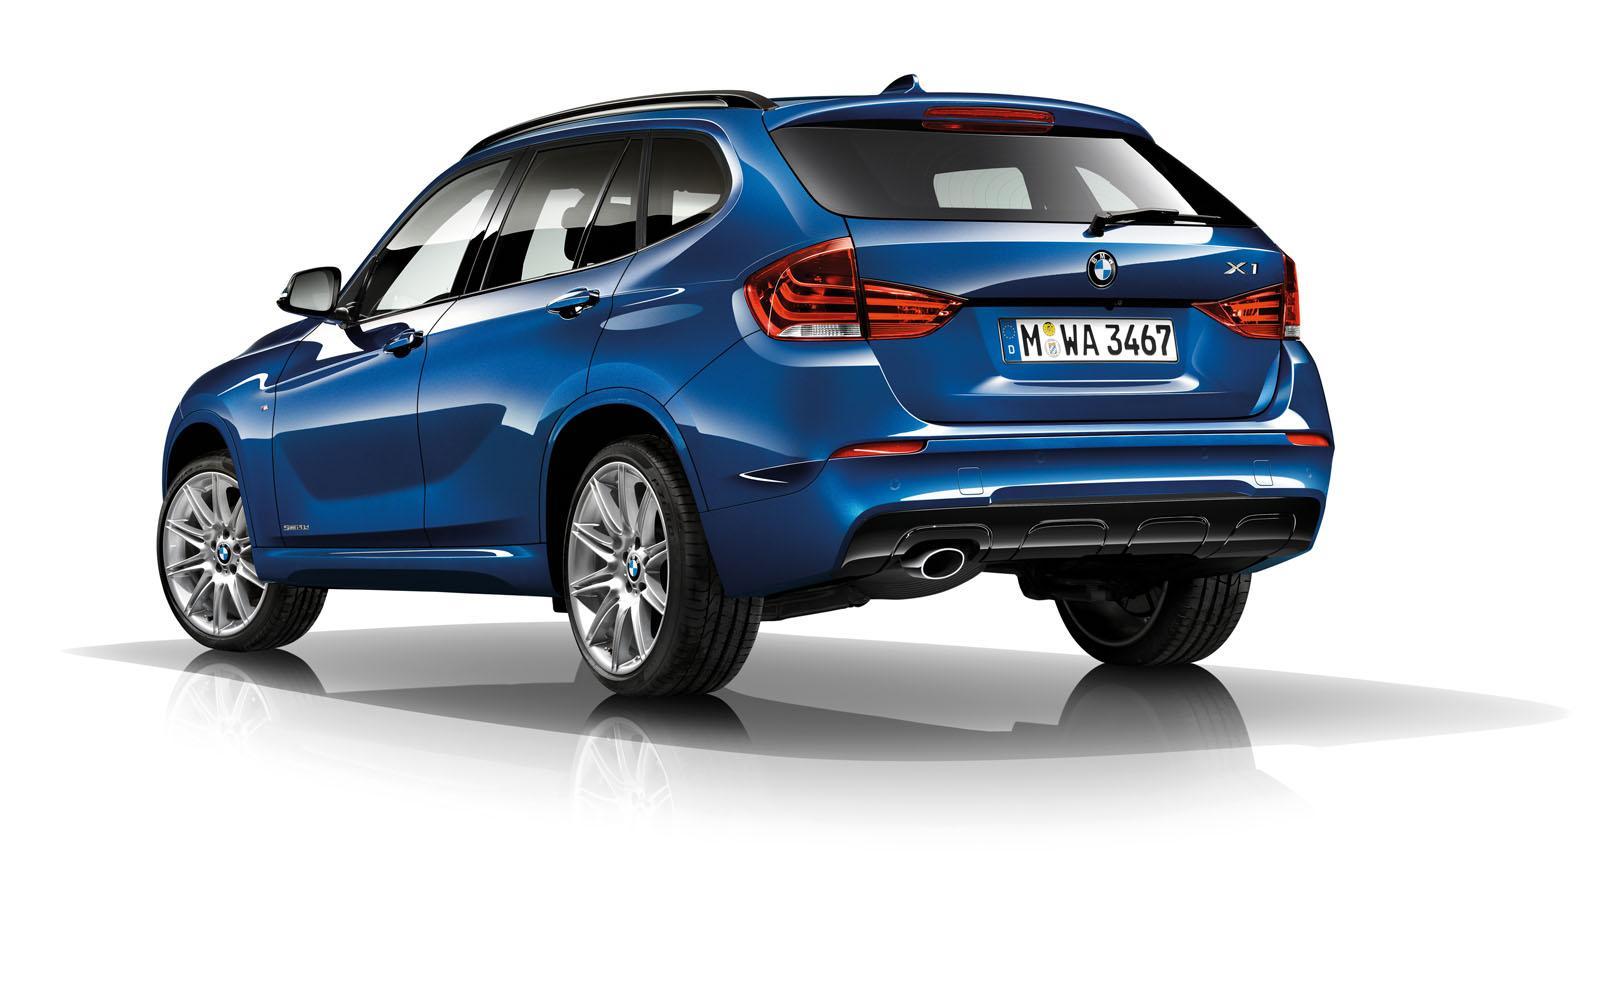 BMW X1 2014 — фотогалерея обновленного кроссовера